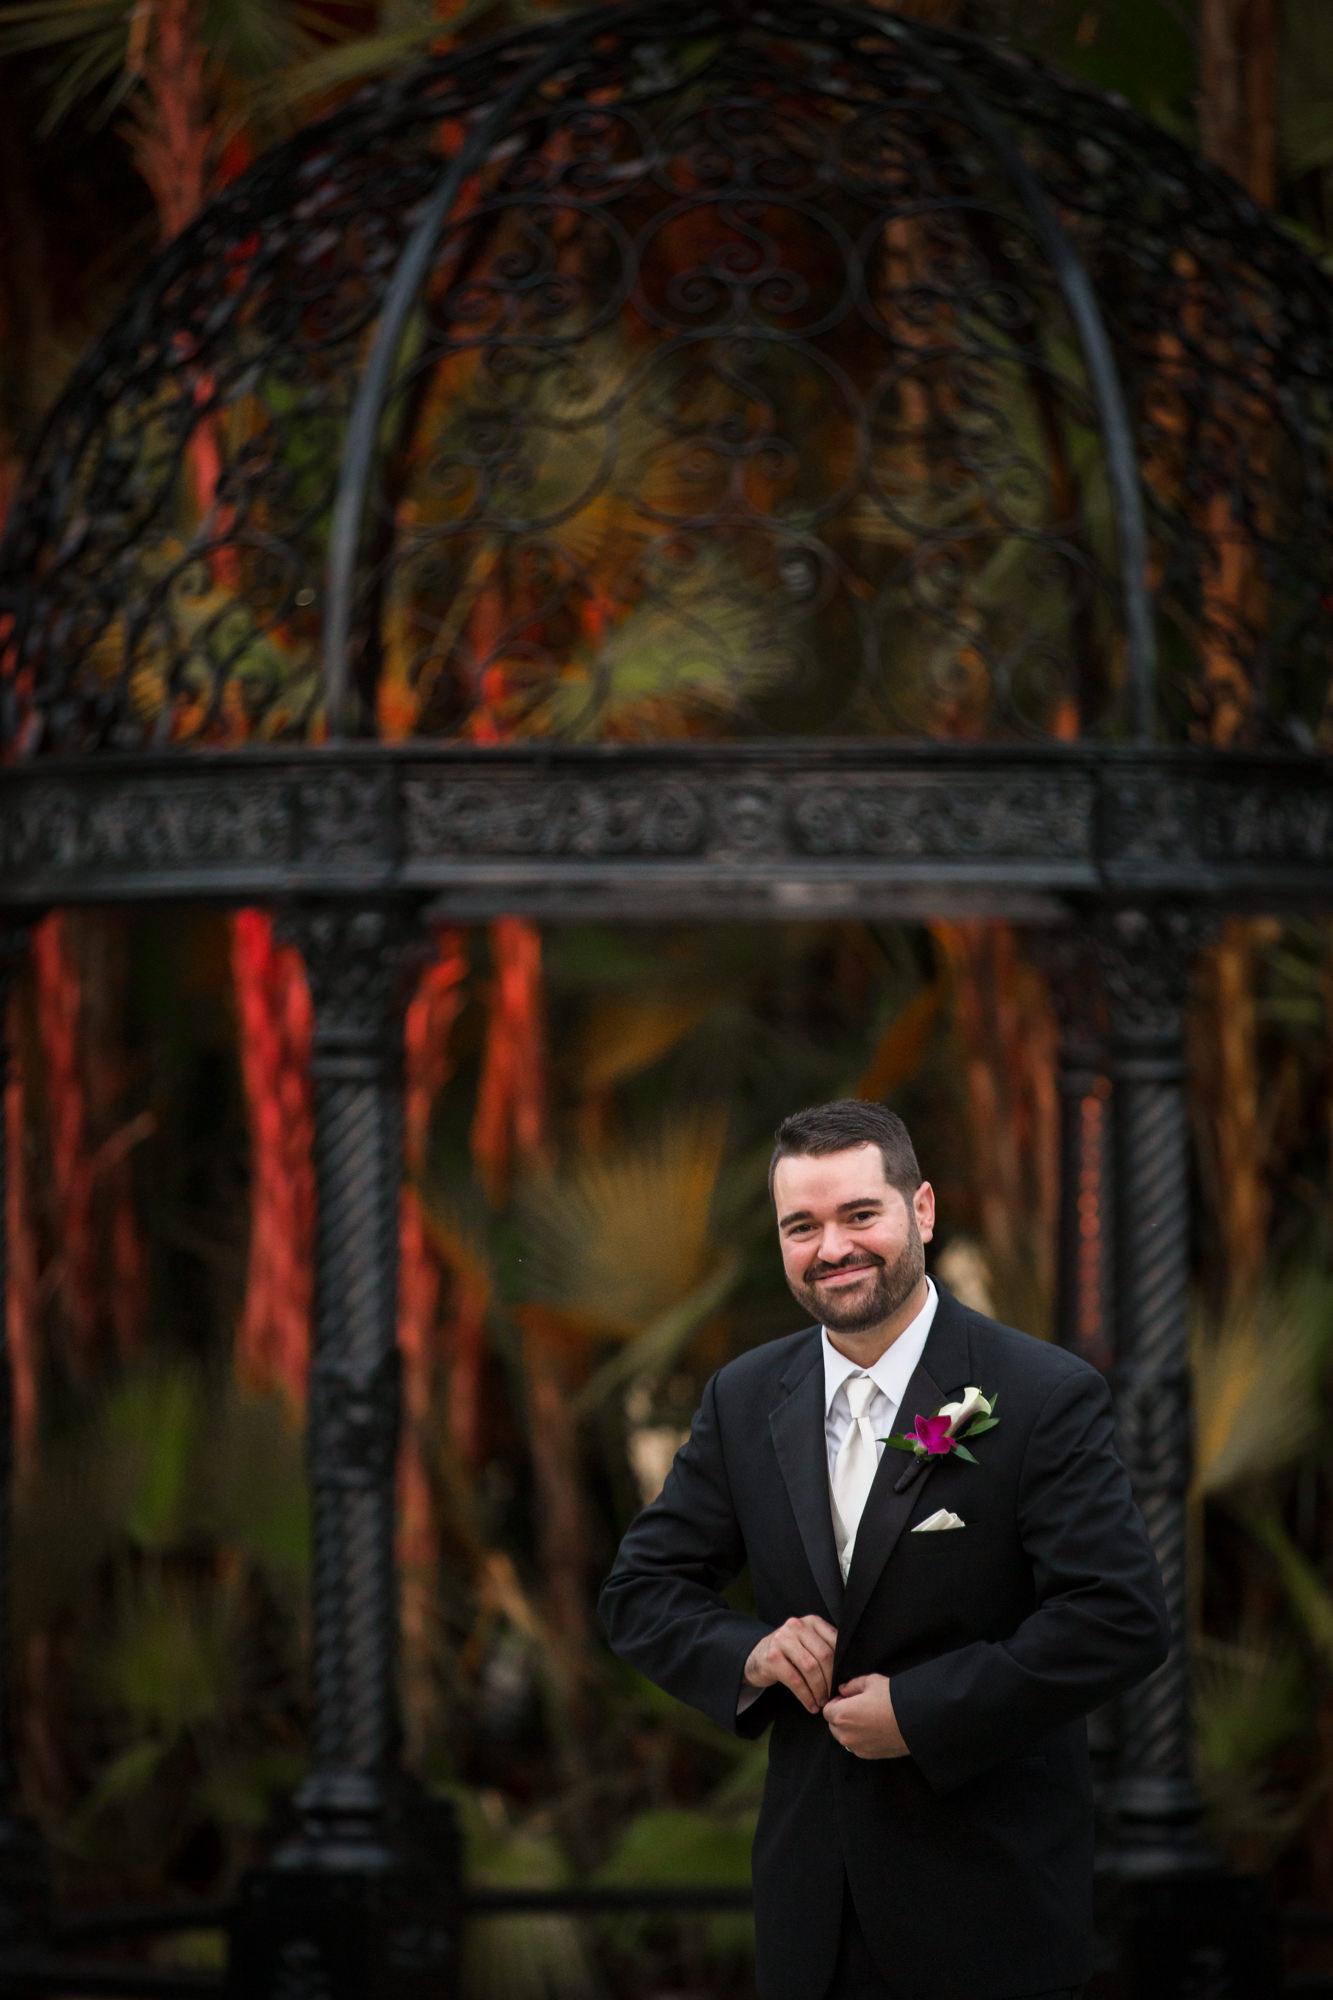 Benvenuto_Wedding_catholic_Florida_Bride-Groom-80.jpg